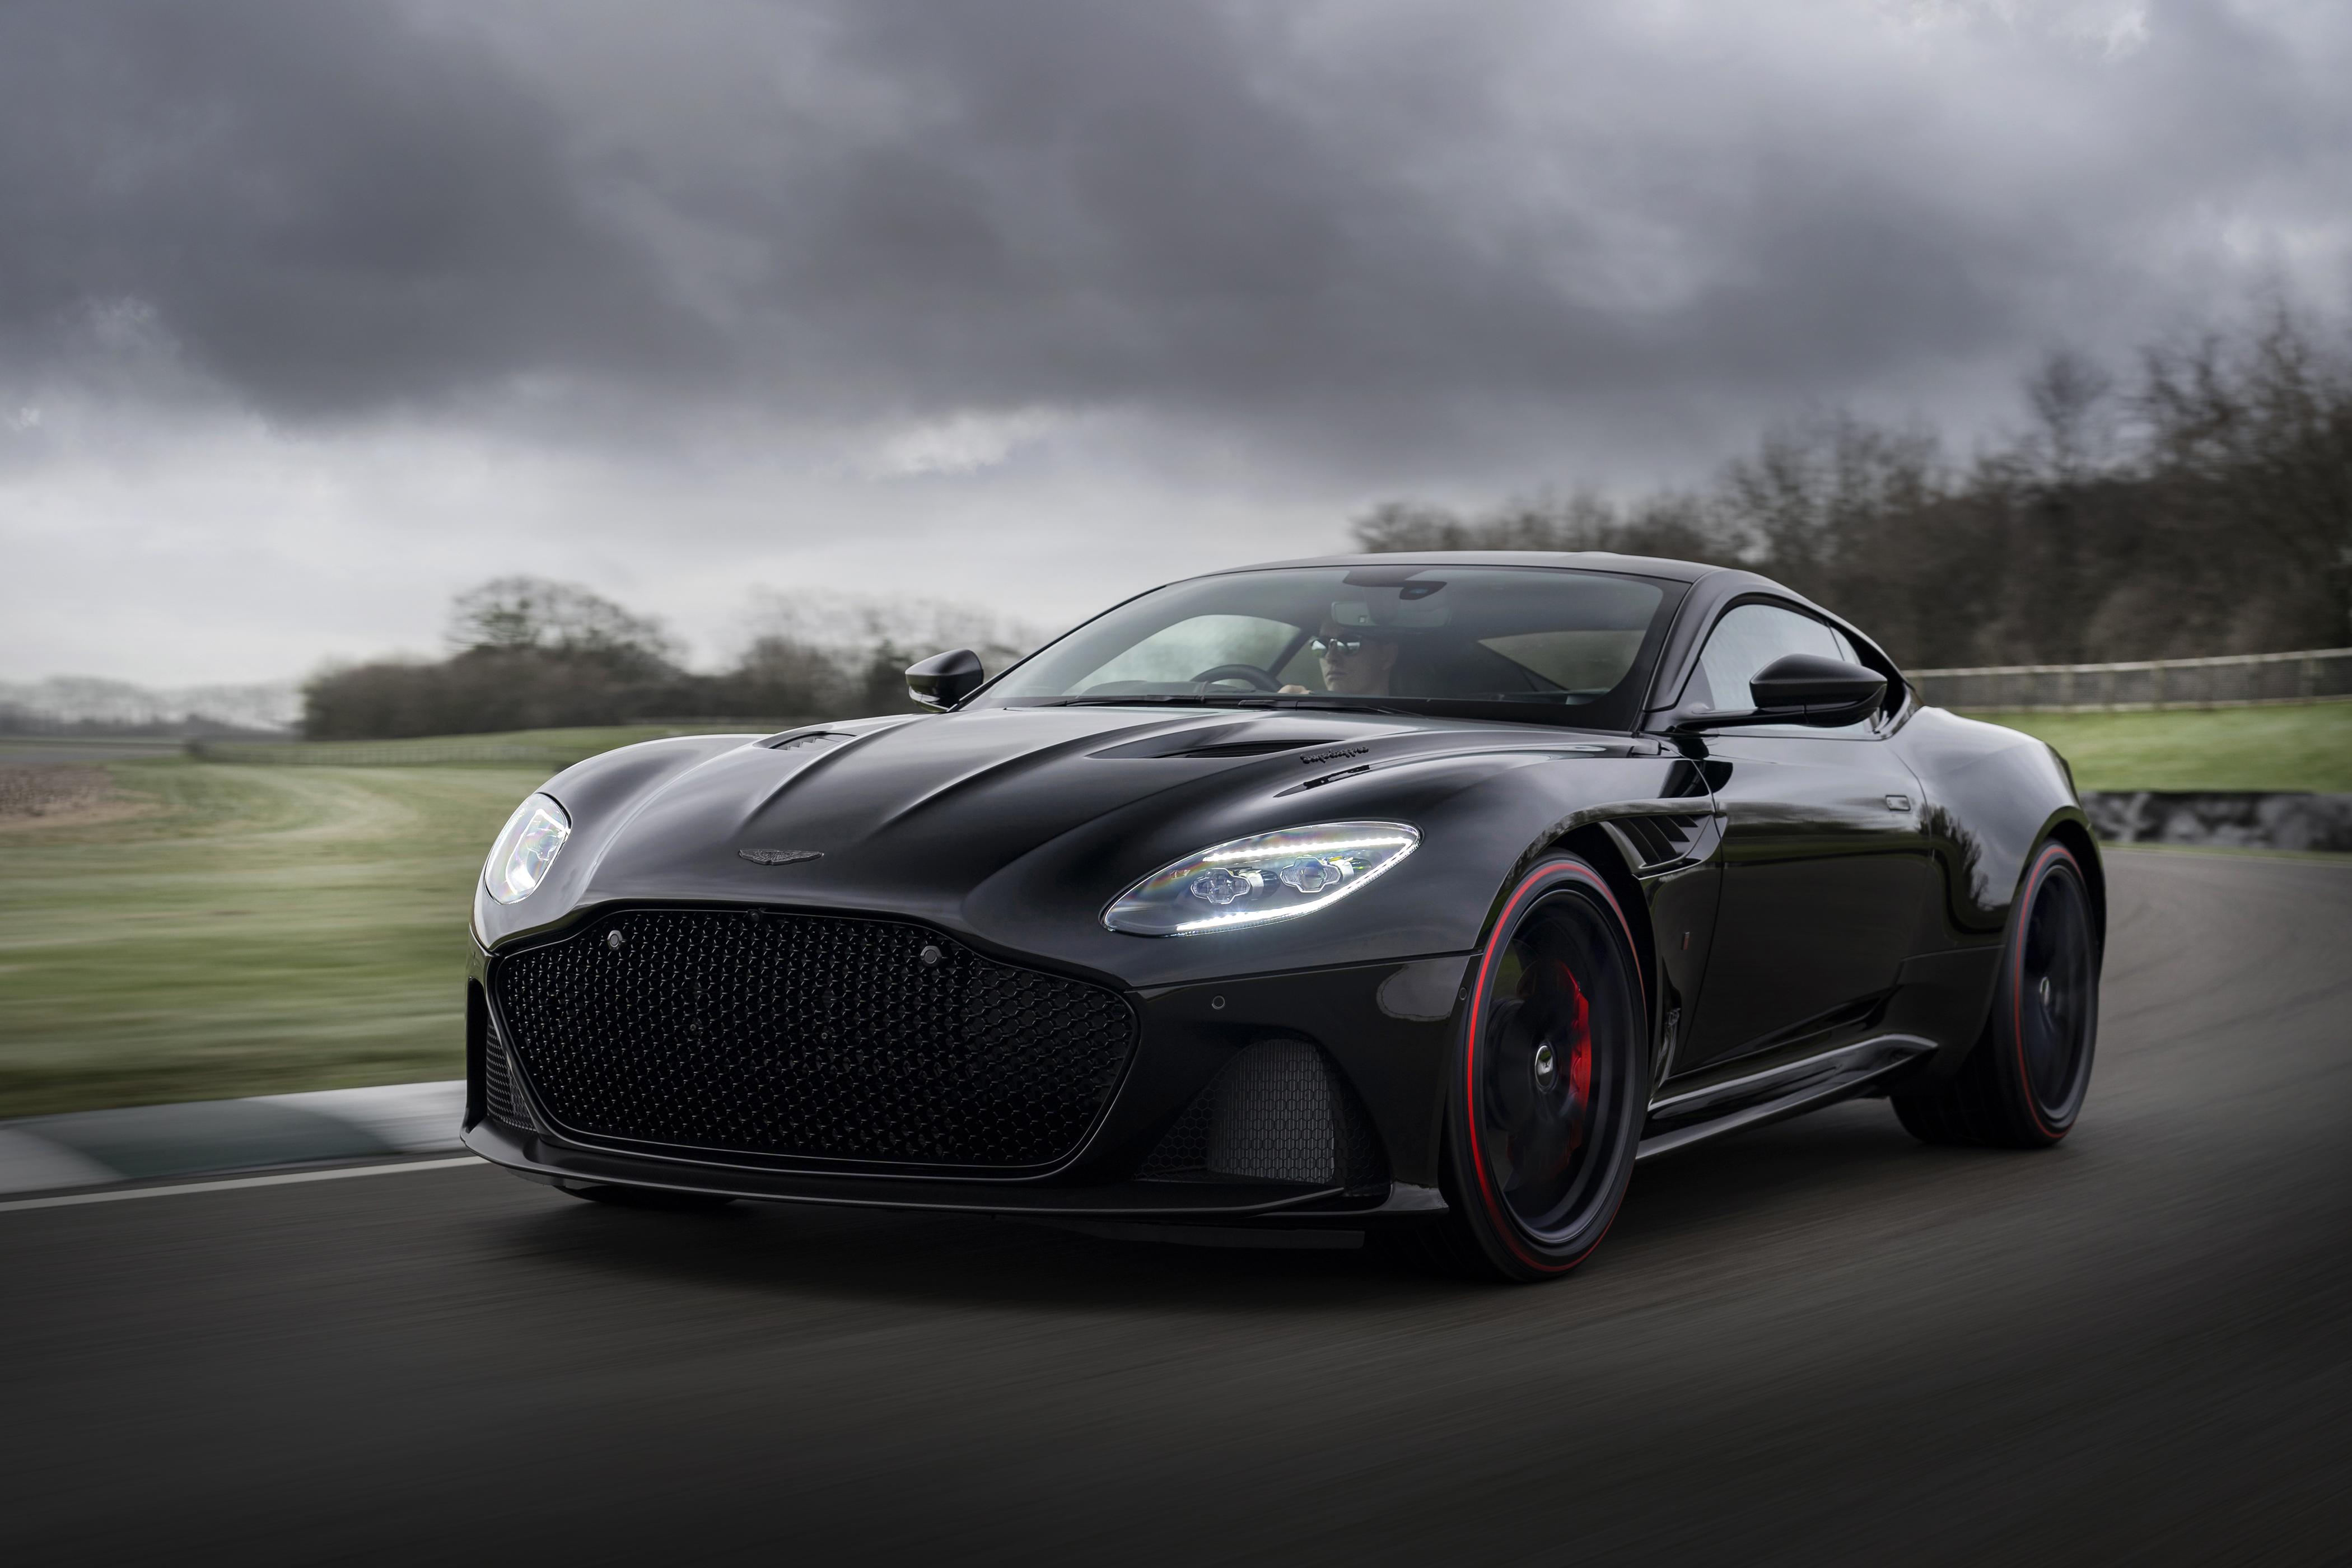 Aston Martin Dbs Superleggera 4k Ultra Hd Wallpaper